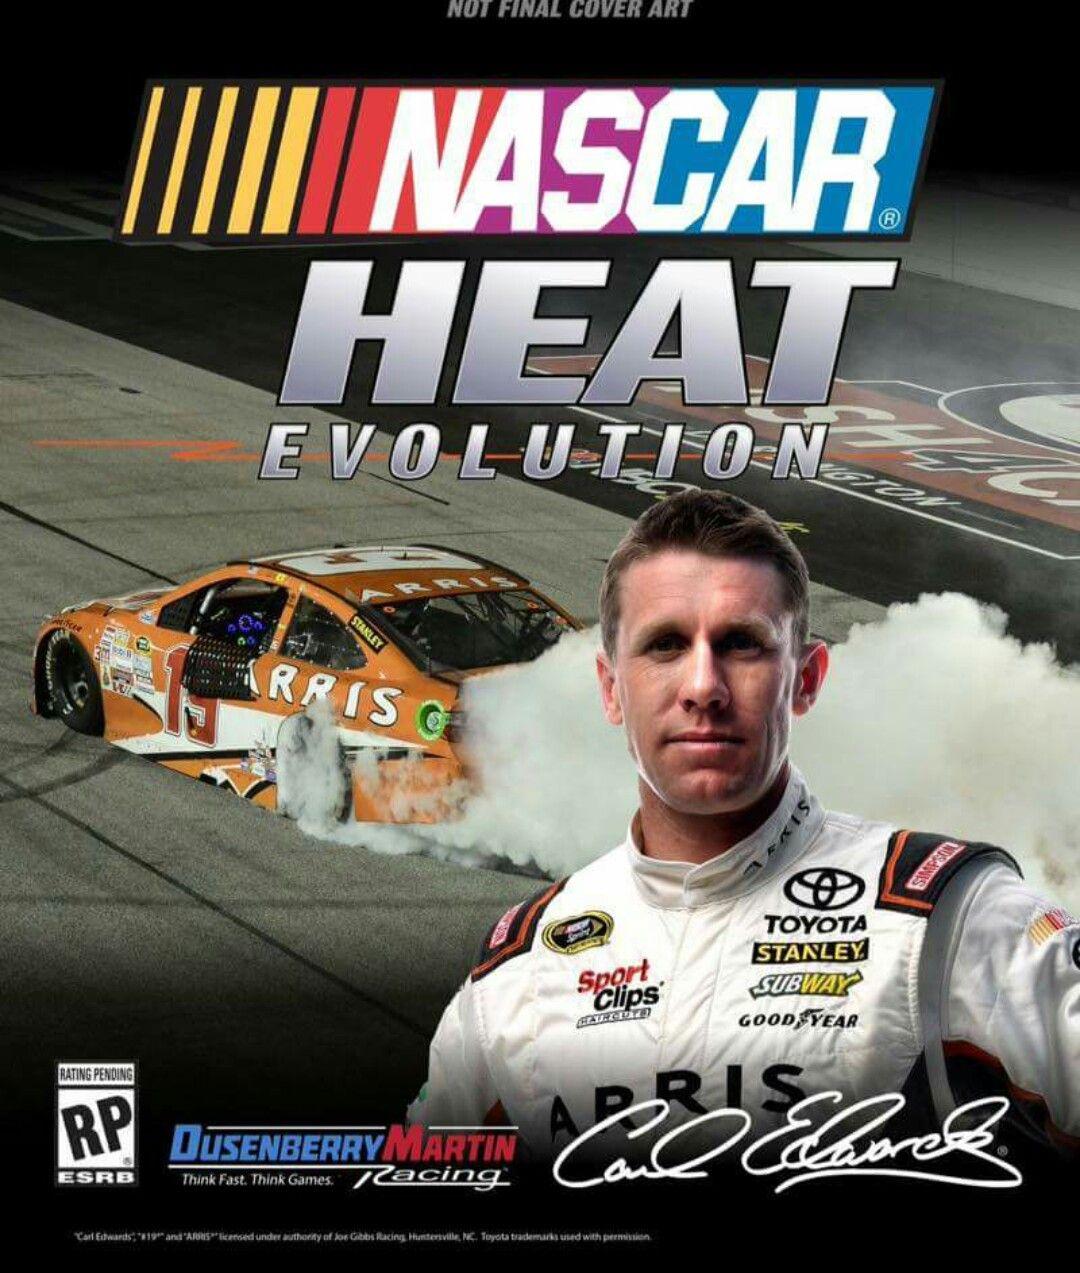 Carl Edwards, 19 Nascar heat, Nascar, Evolution